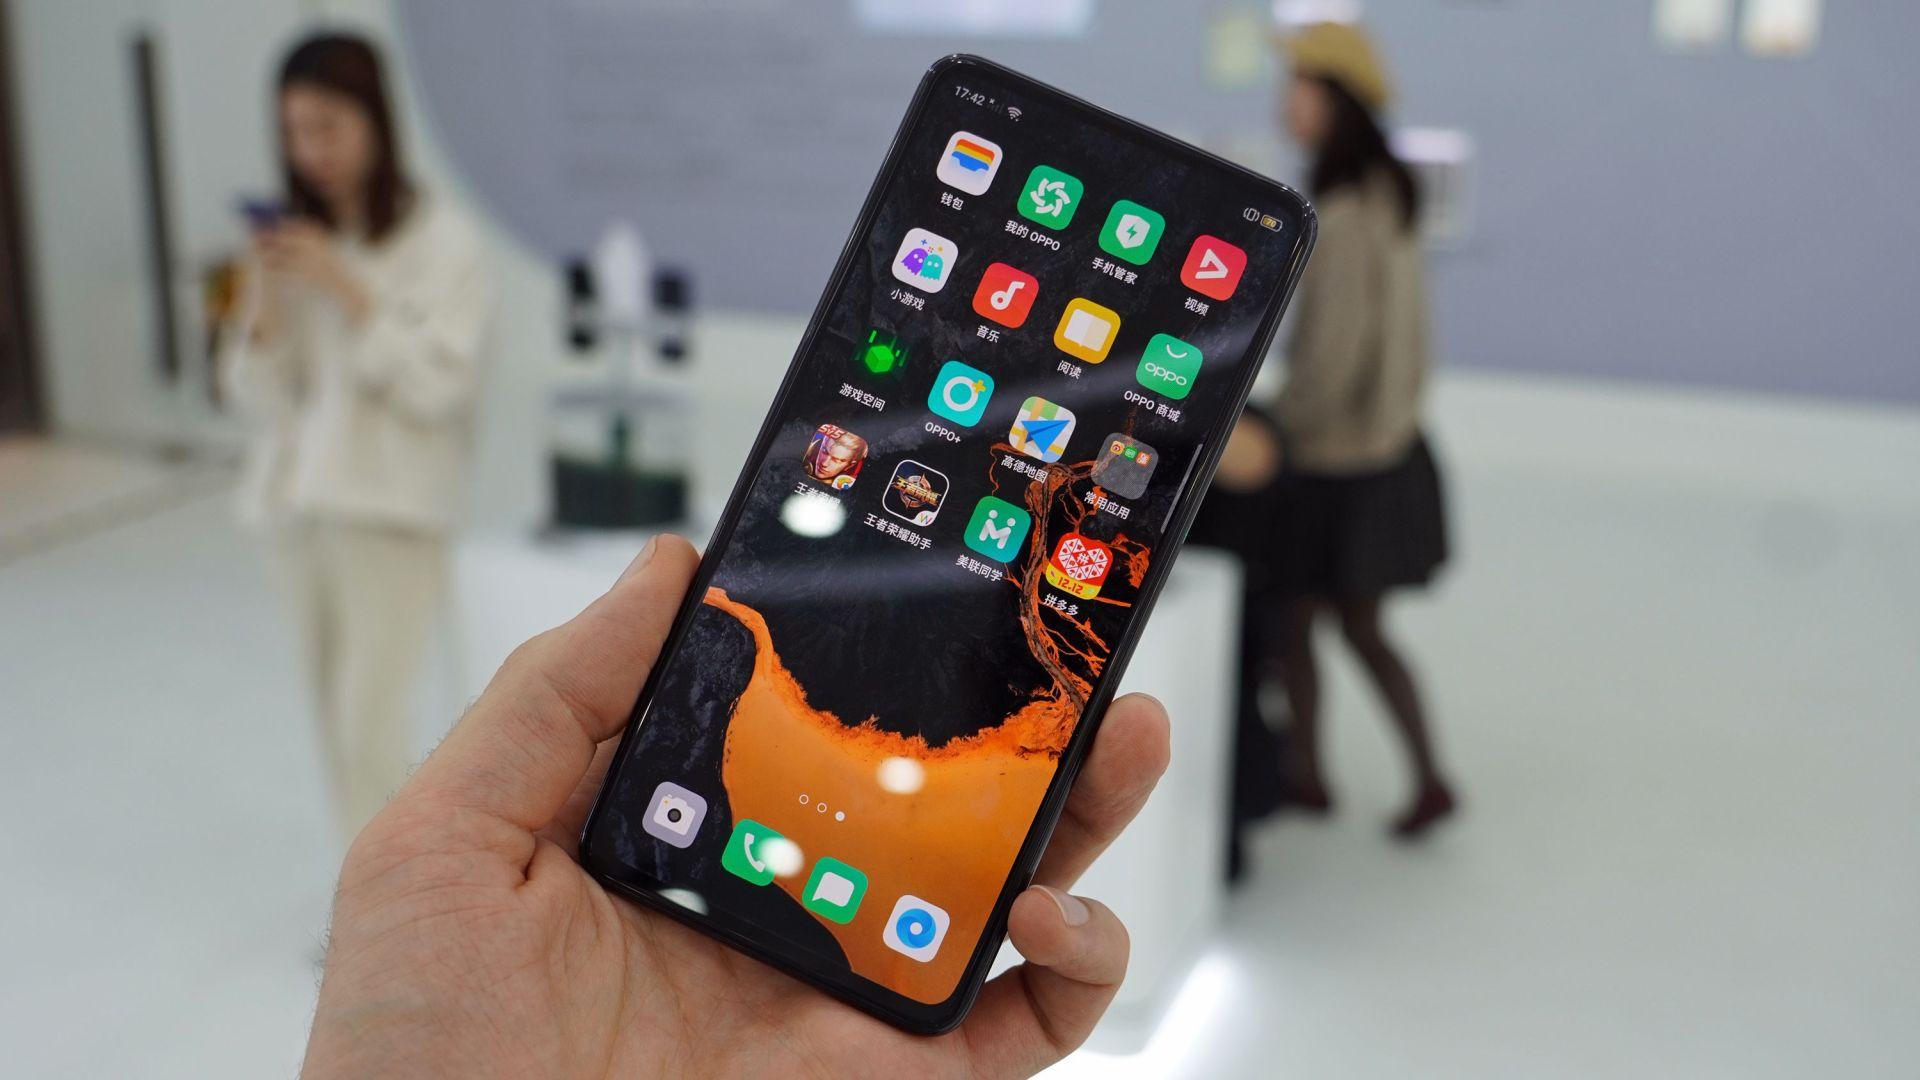 iPhone 12 apple 5g